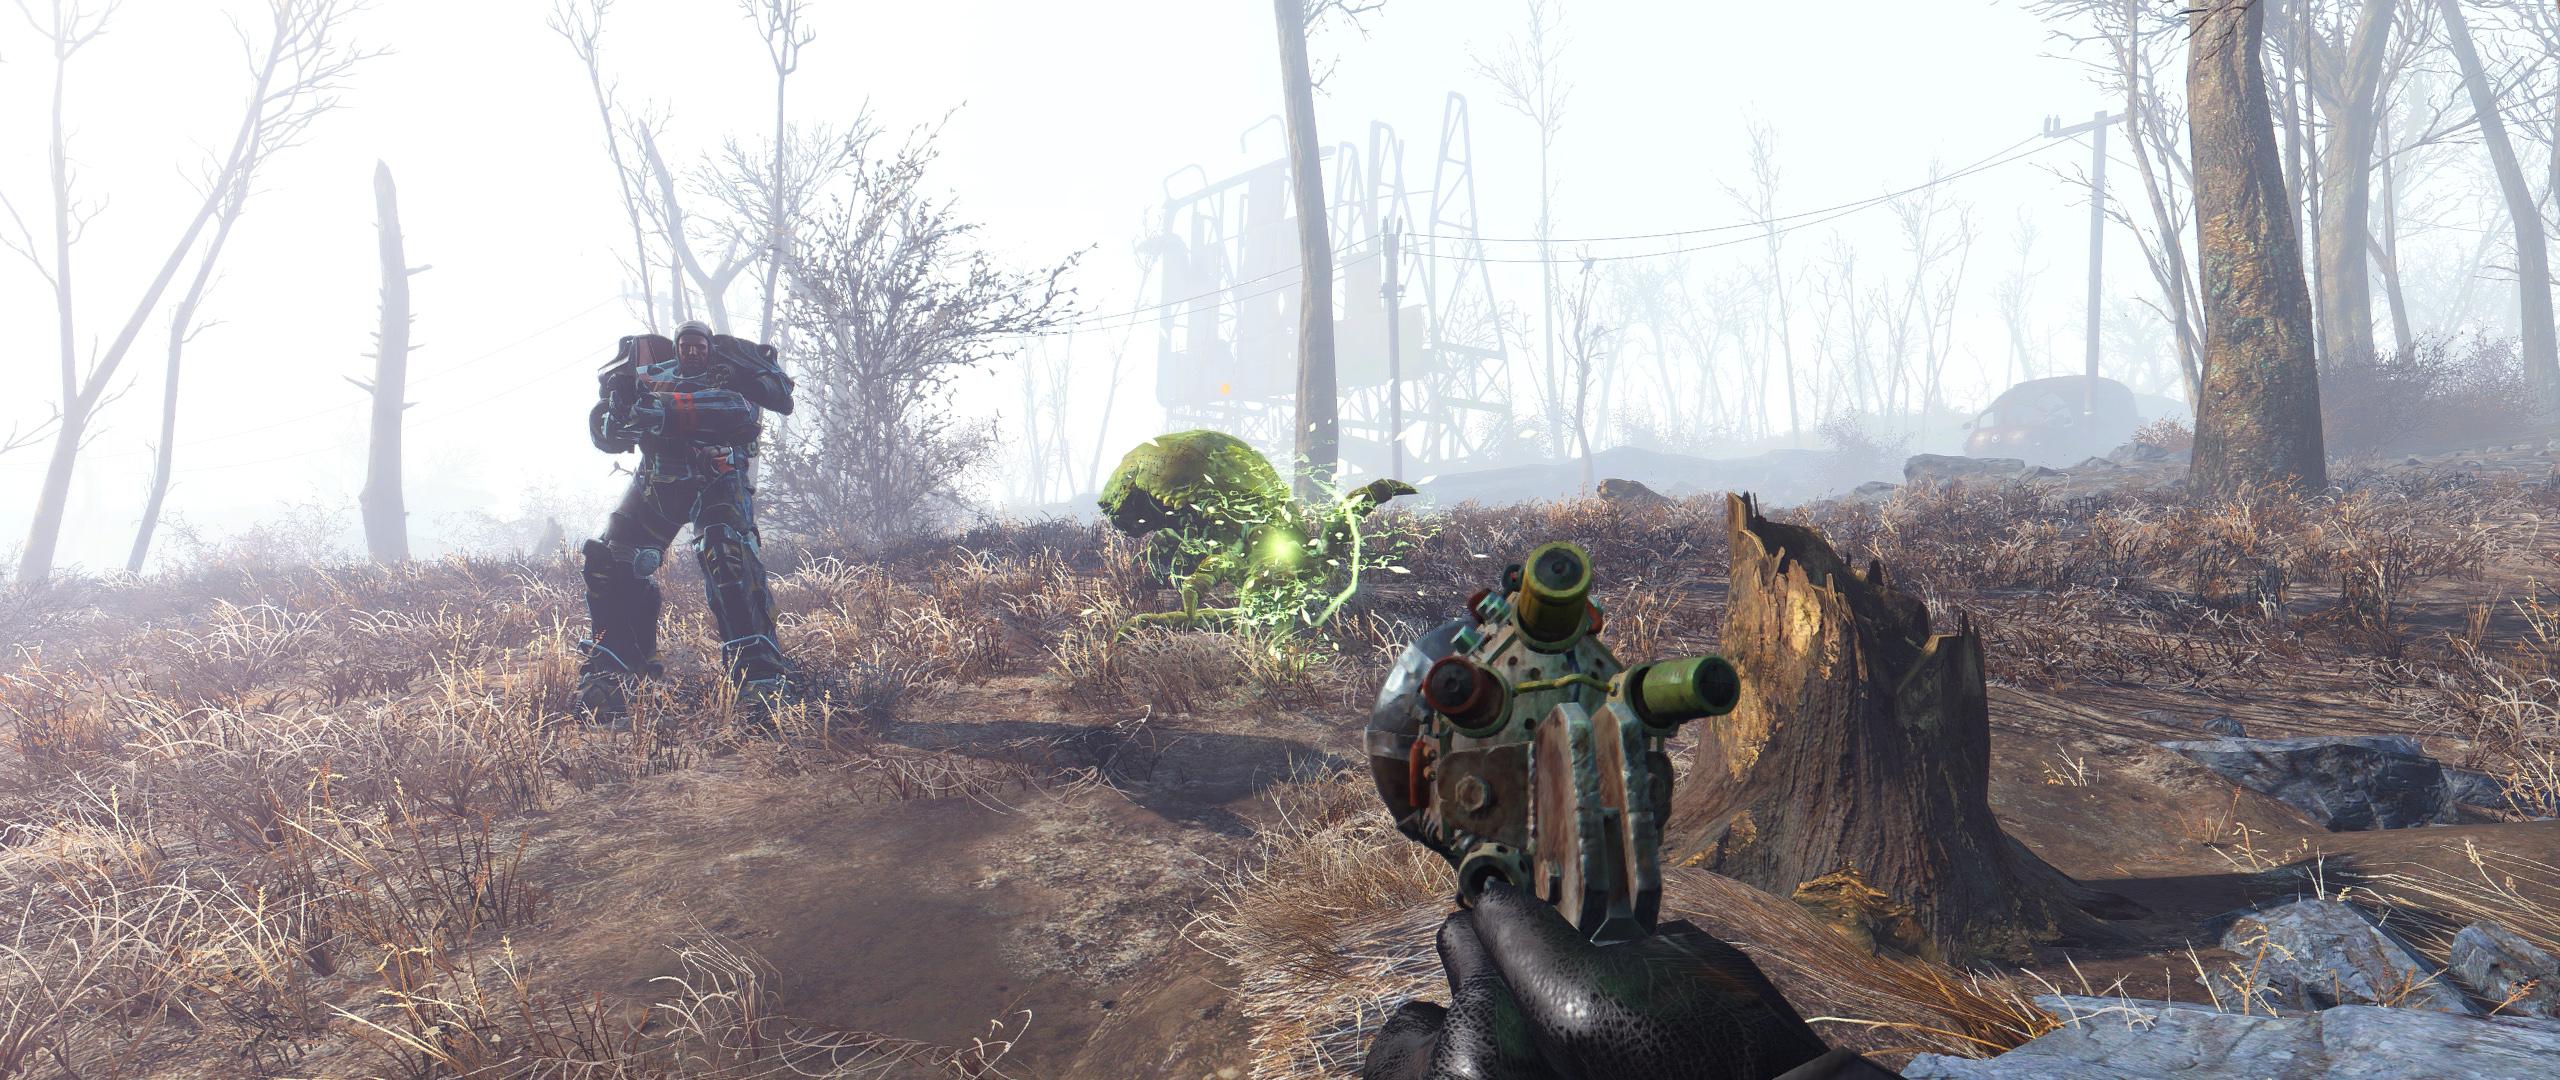 Enhanced Wasteland Preset 1.0 для Fallout 4 - Скриншот 1